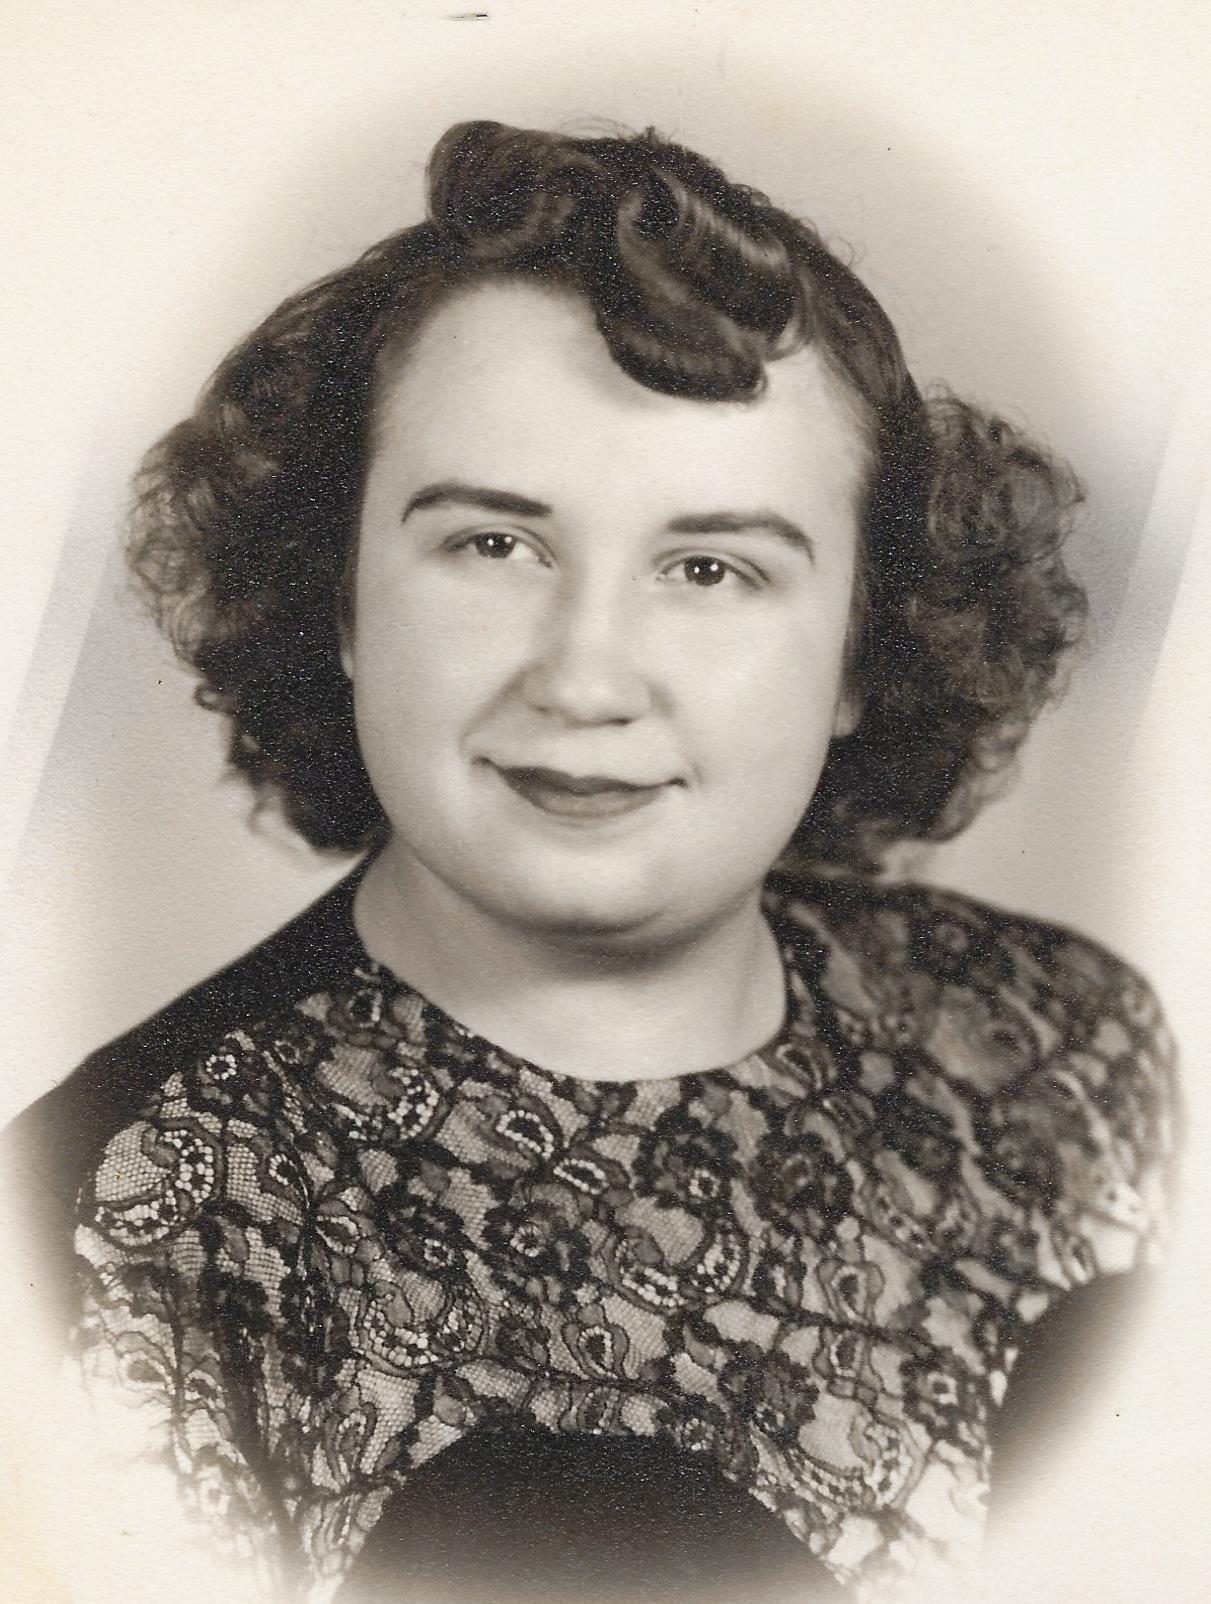 Wanda H. Katro